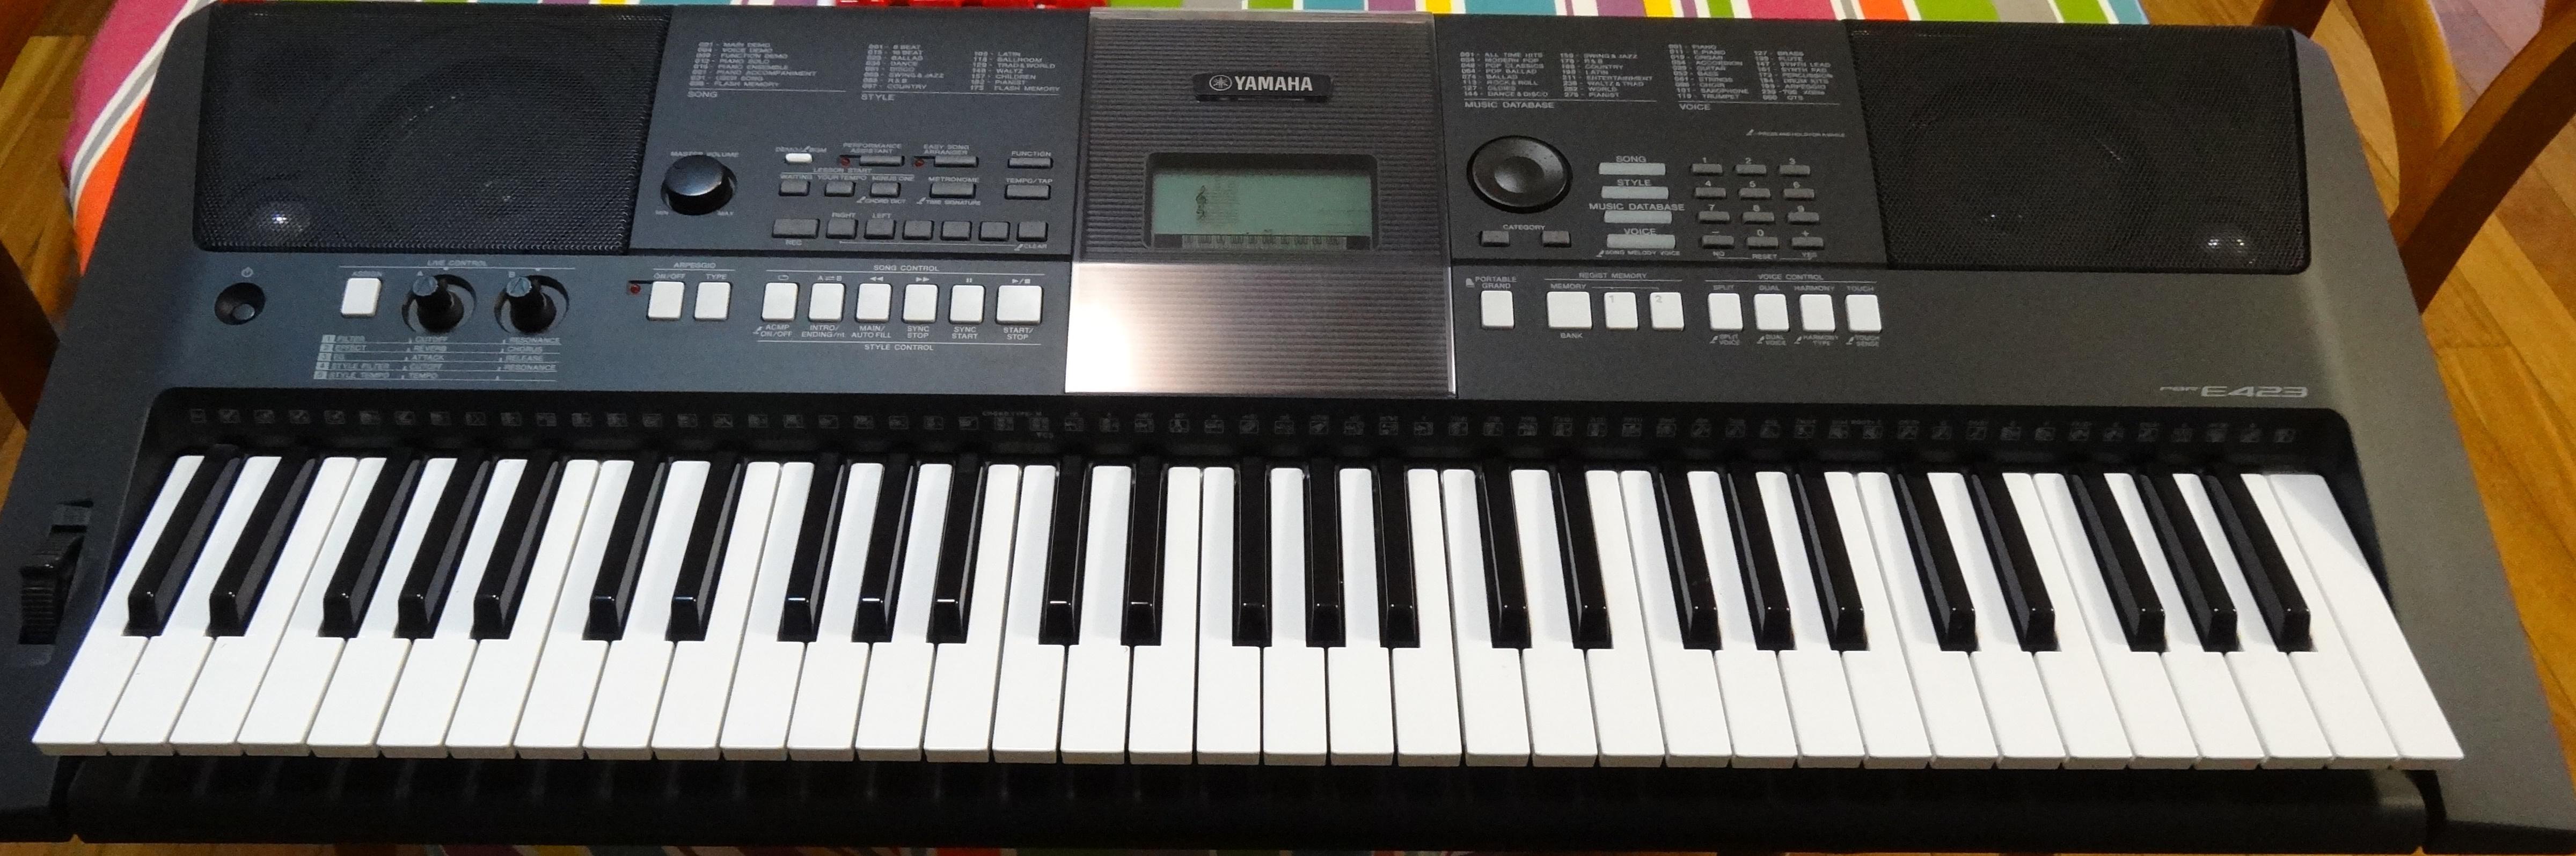 Yamaha psr e423 инструкция